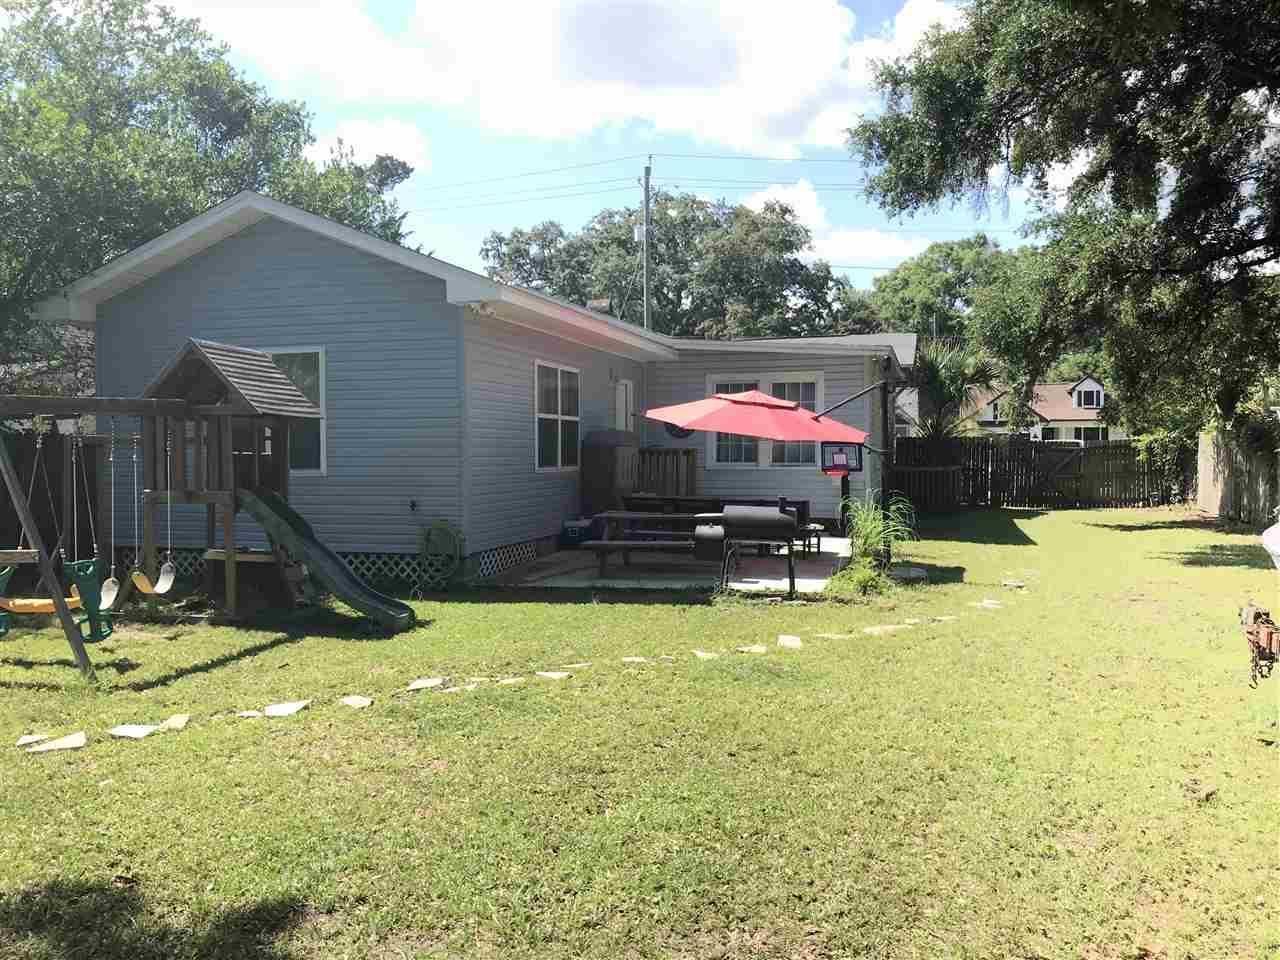 913 E De Soto St, Pensacola, FL 32501